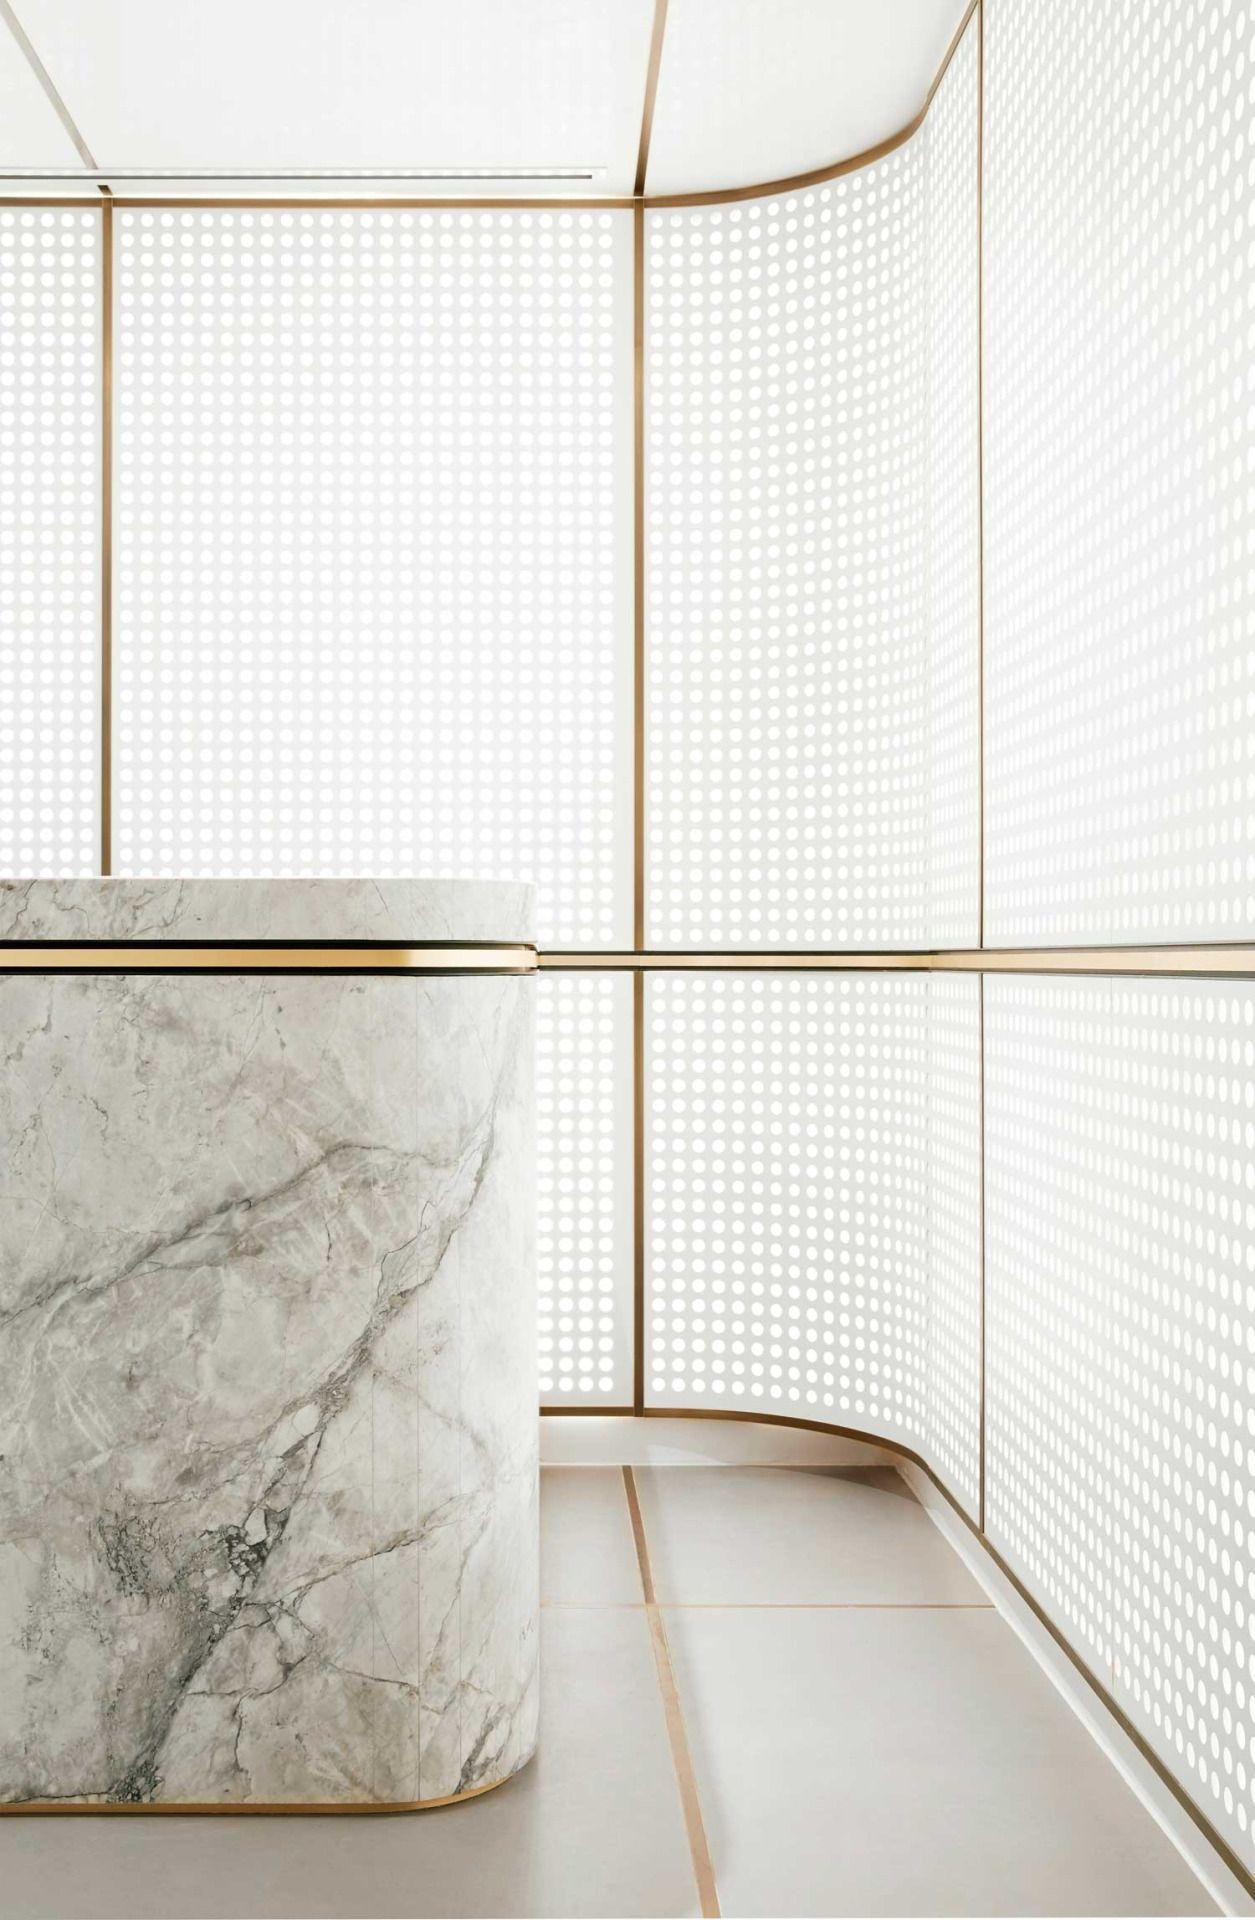 Interior design blog lli design london photo for Riviste interior design